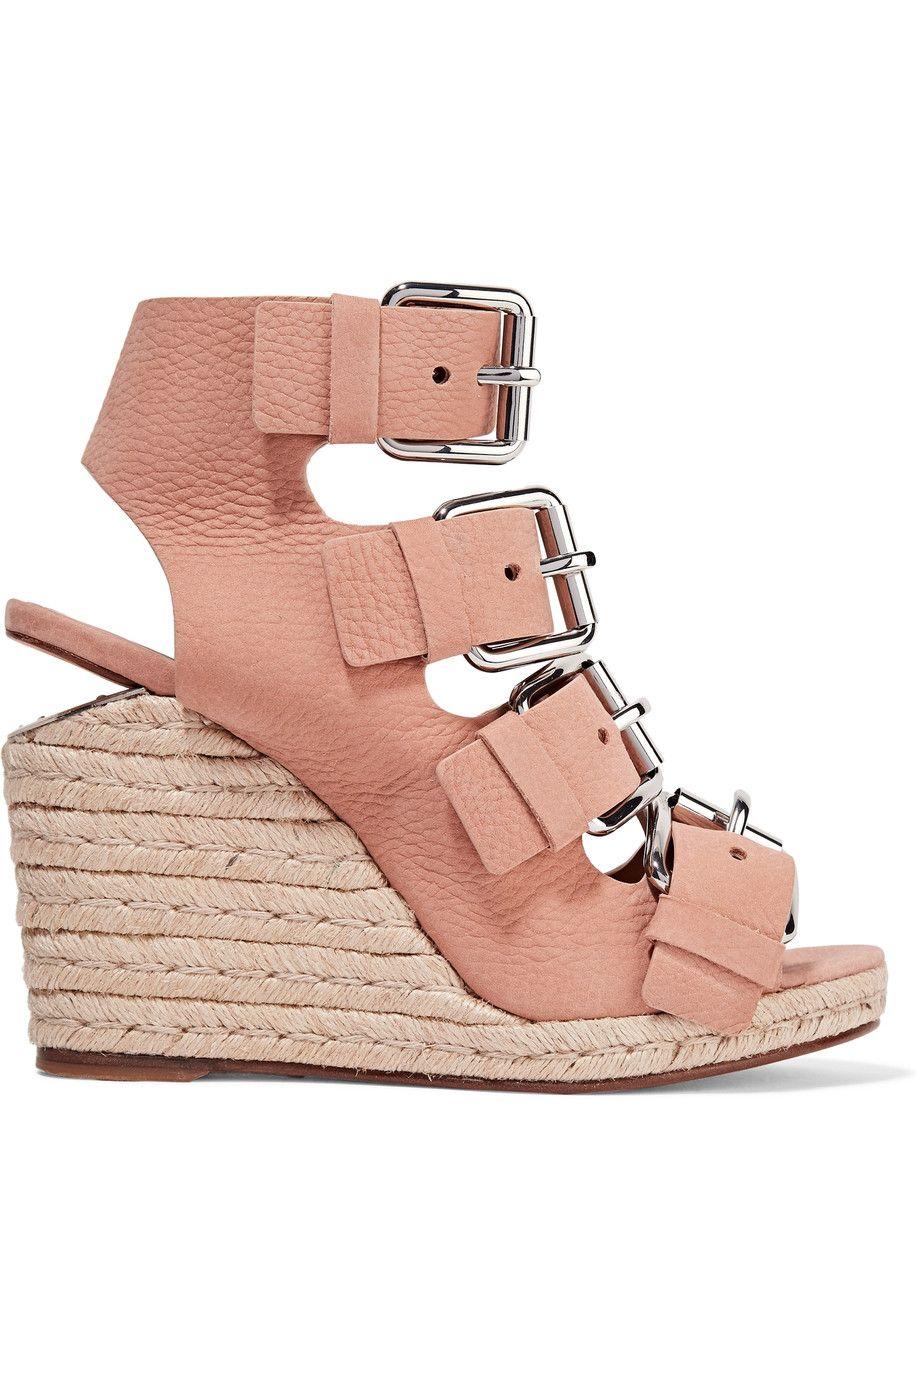 Jo nubuck wedge sandals | ALEXANDER WANG | Sale up to 70% off